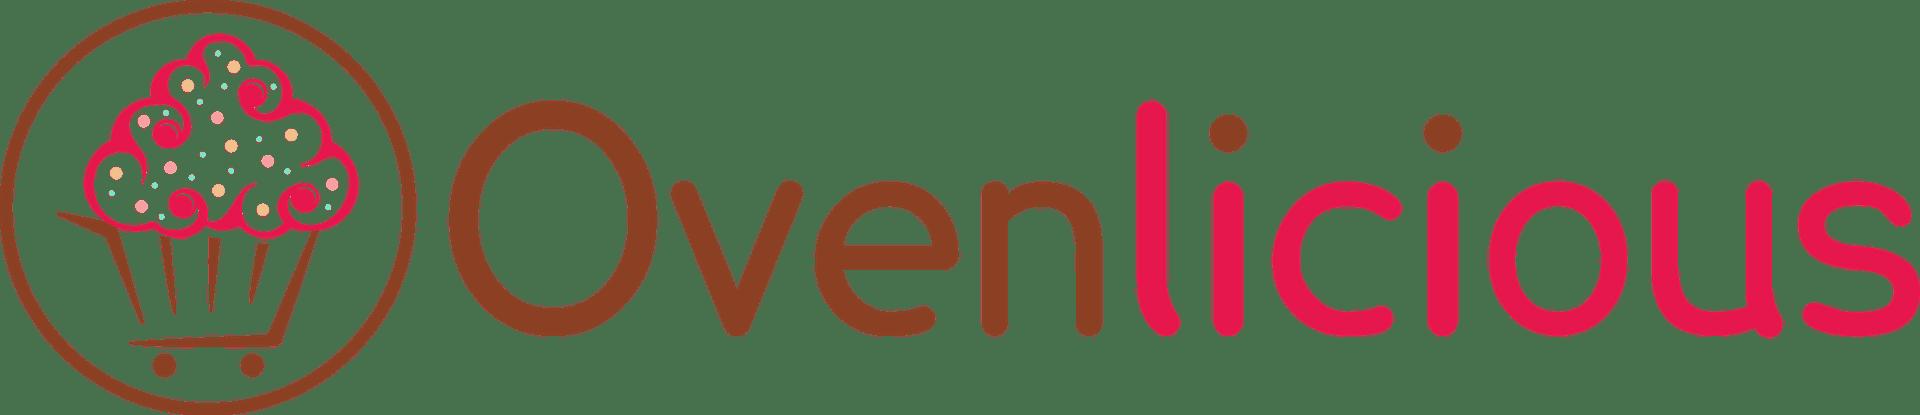 Ovenlicious logo